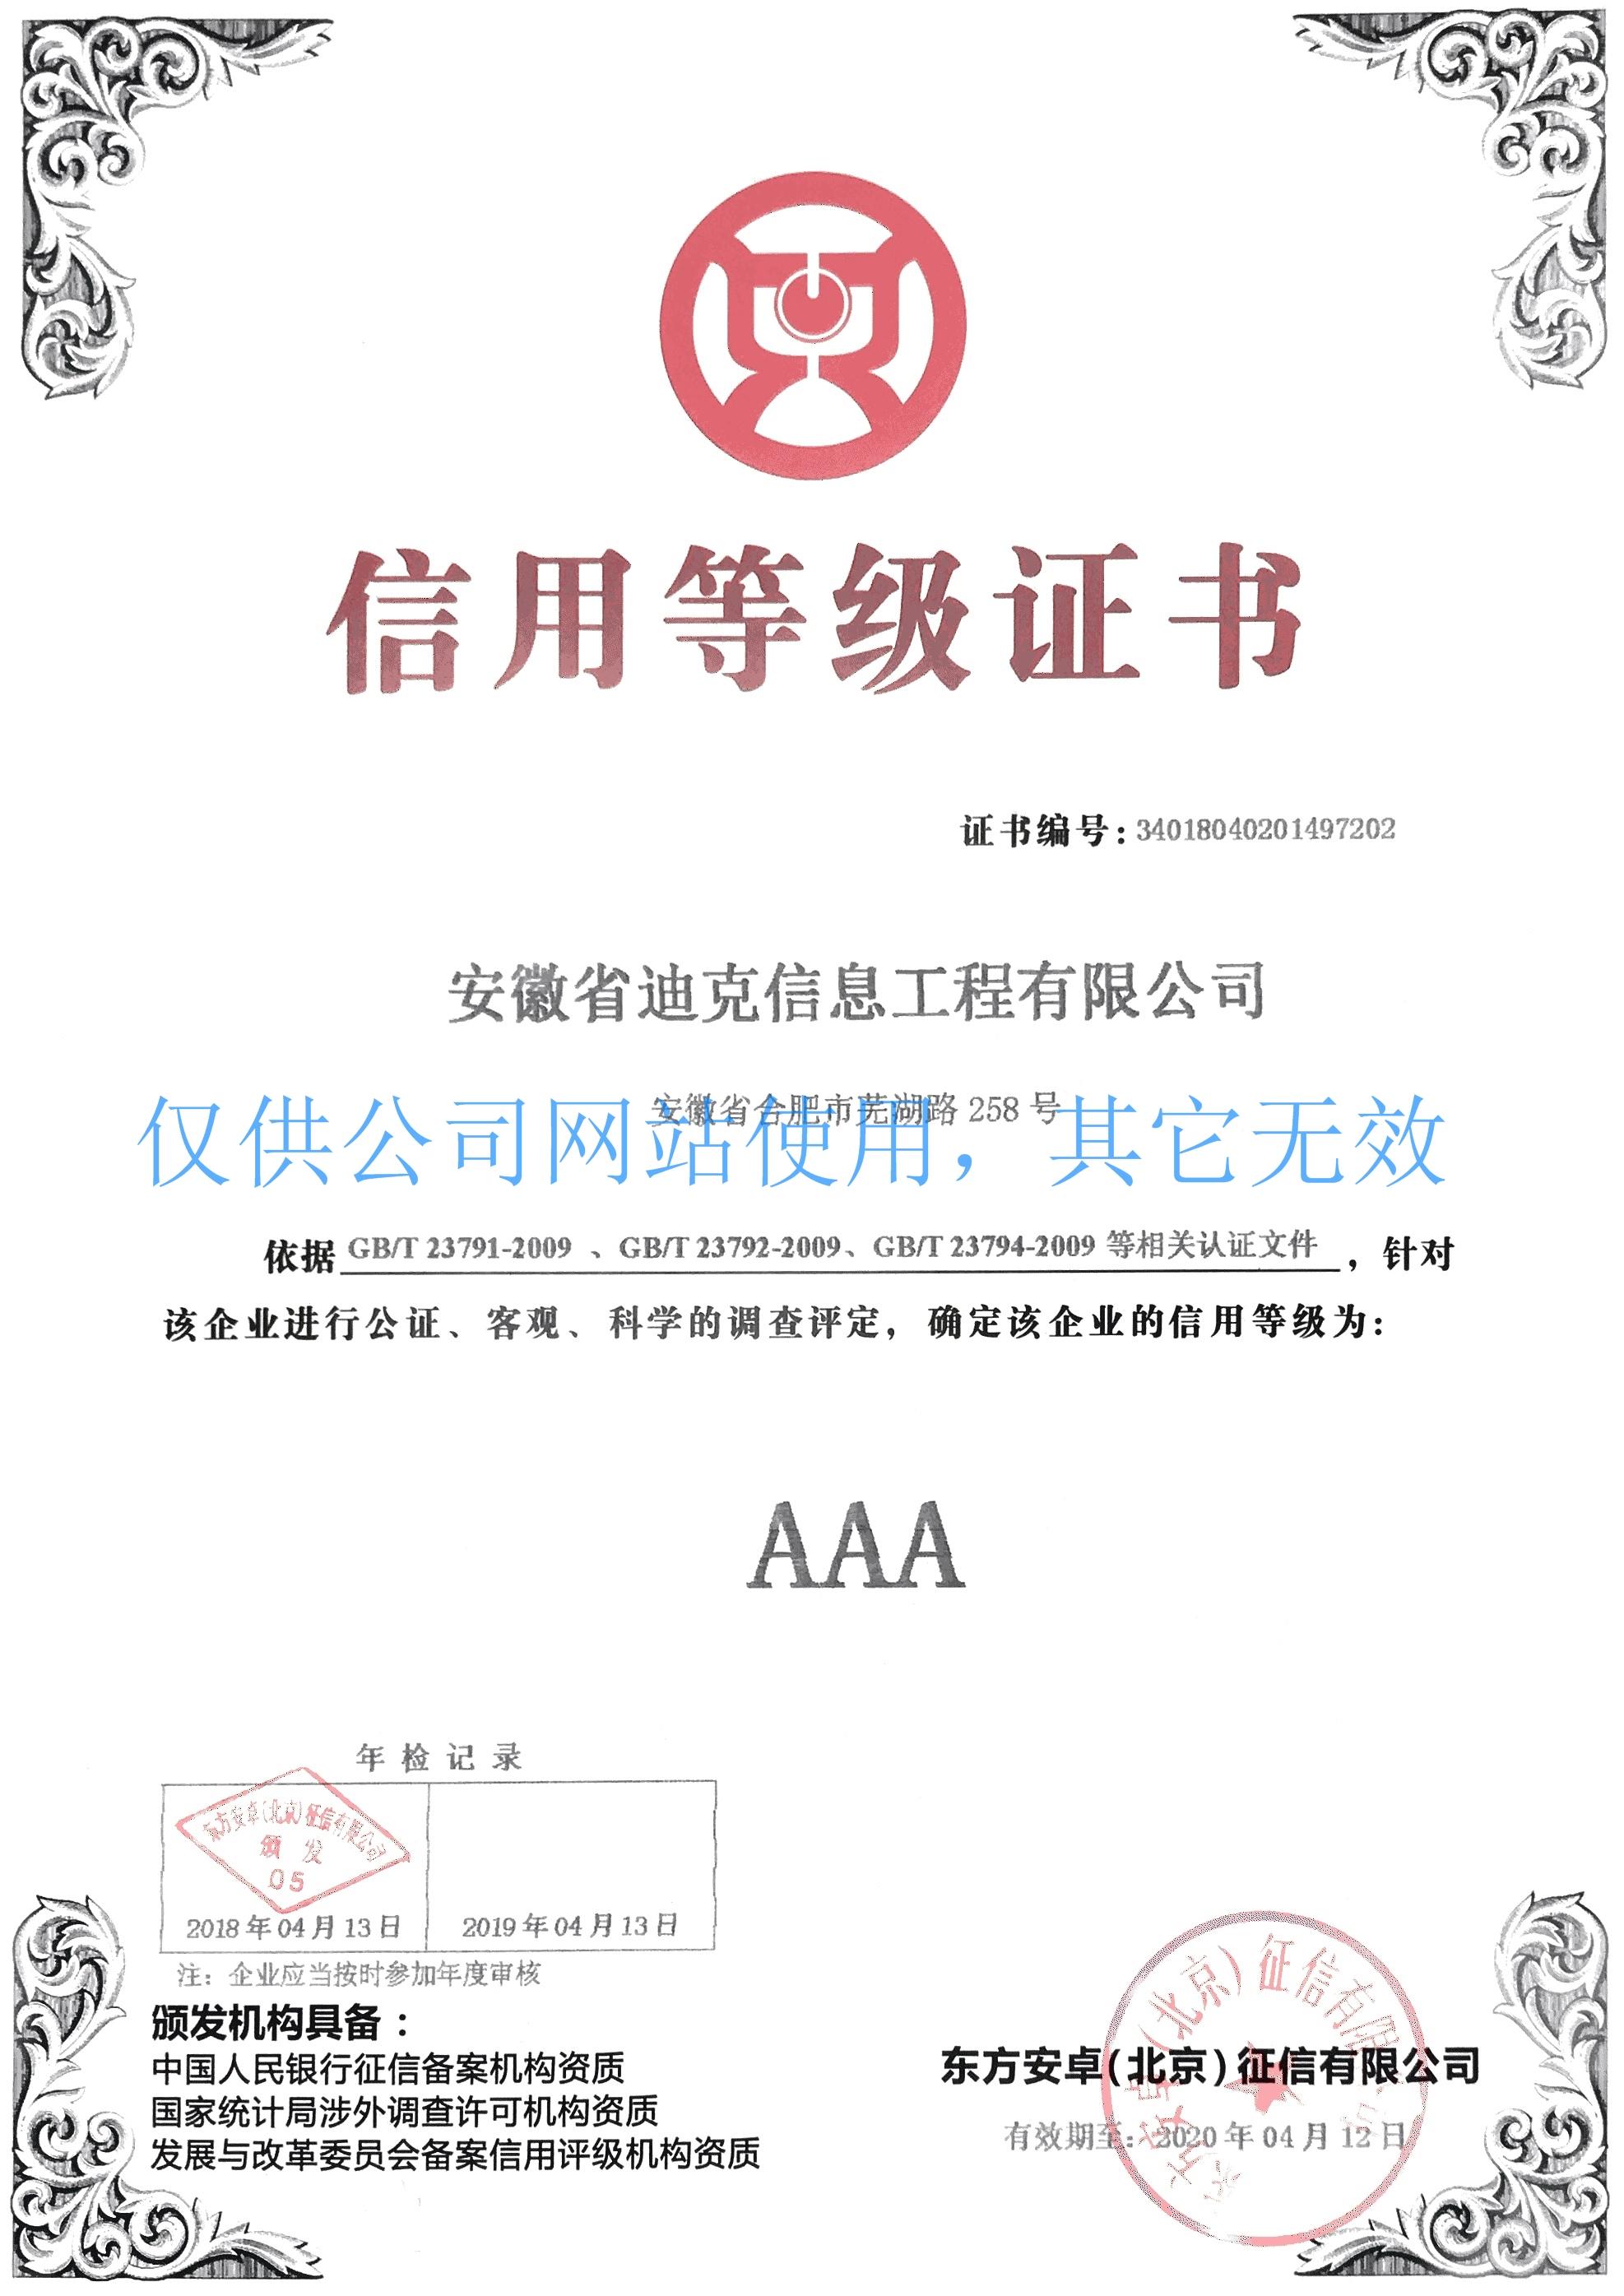 AAA級信用企業等級認證證書